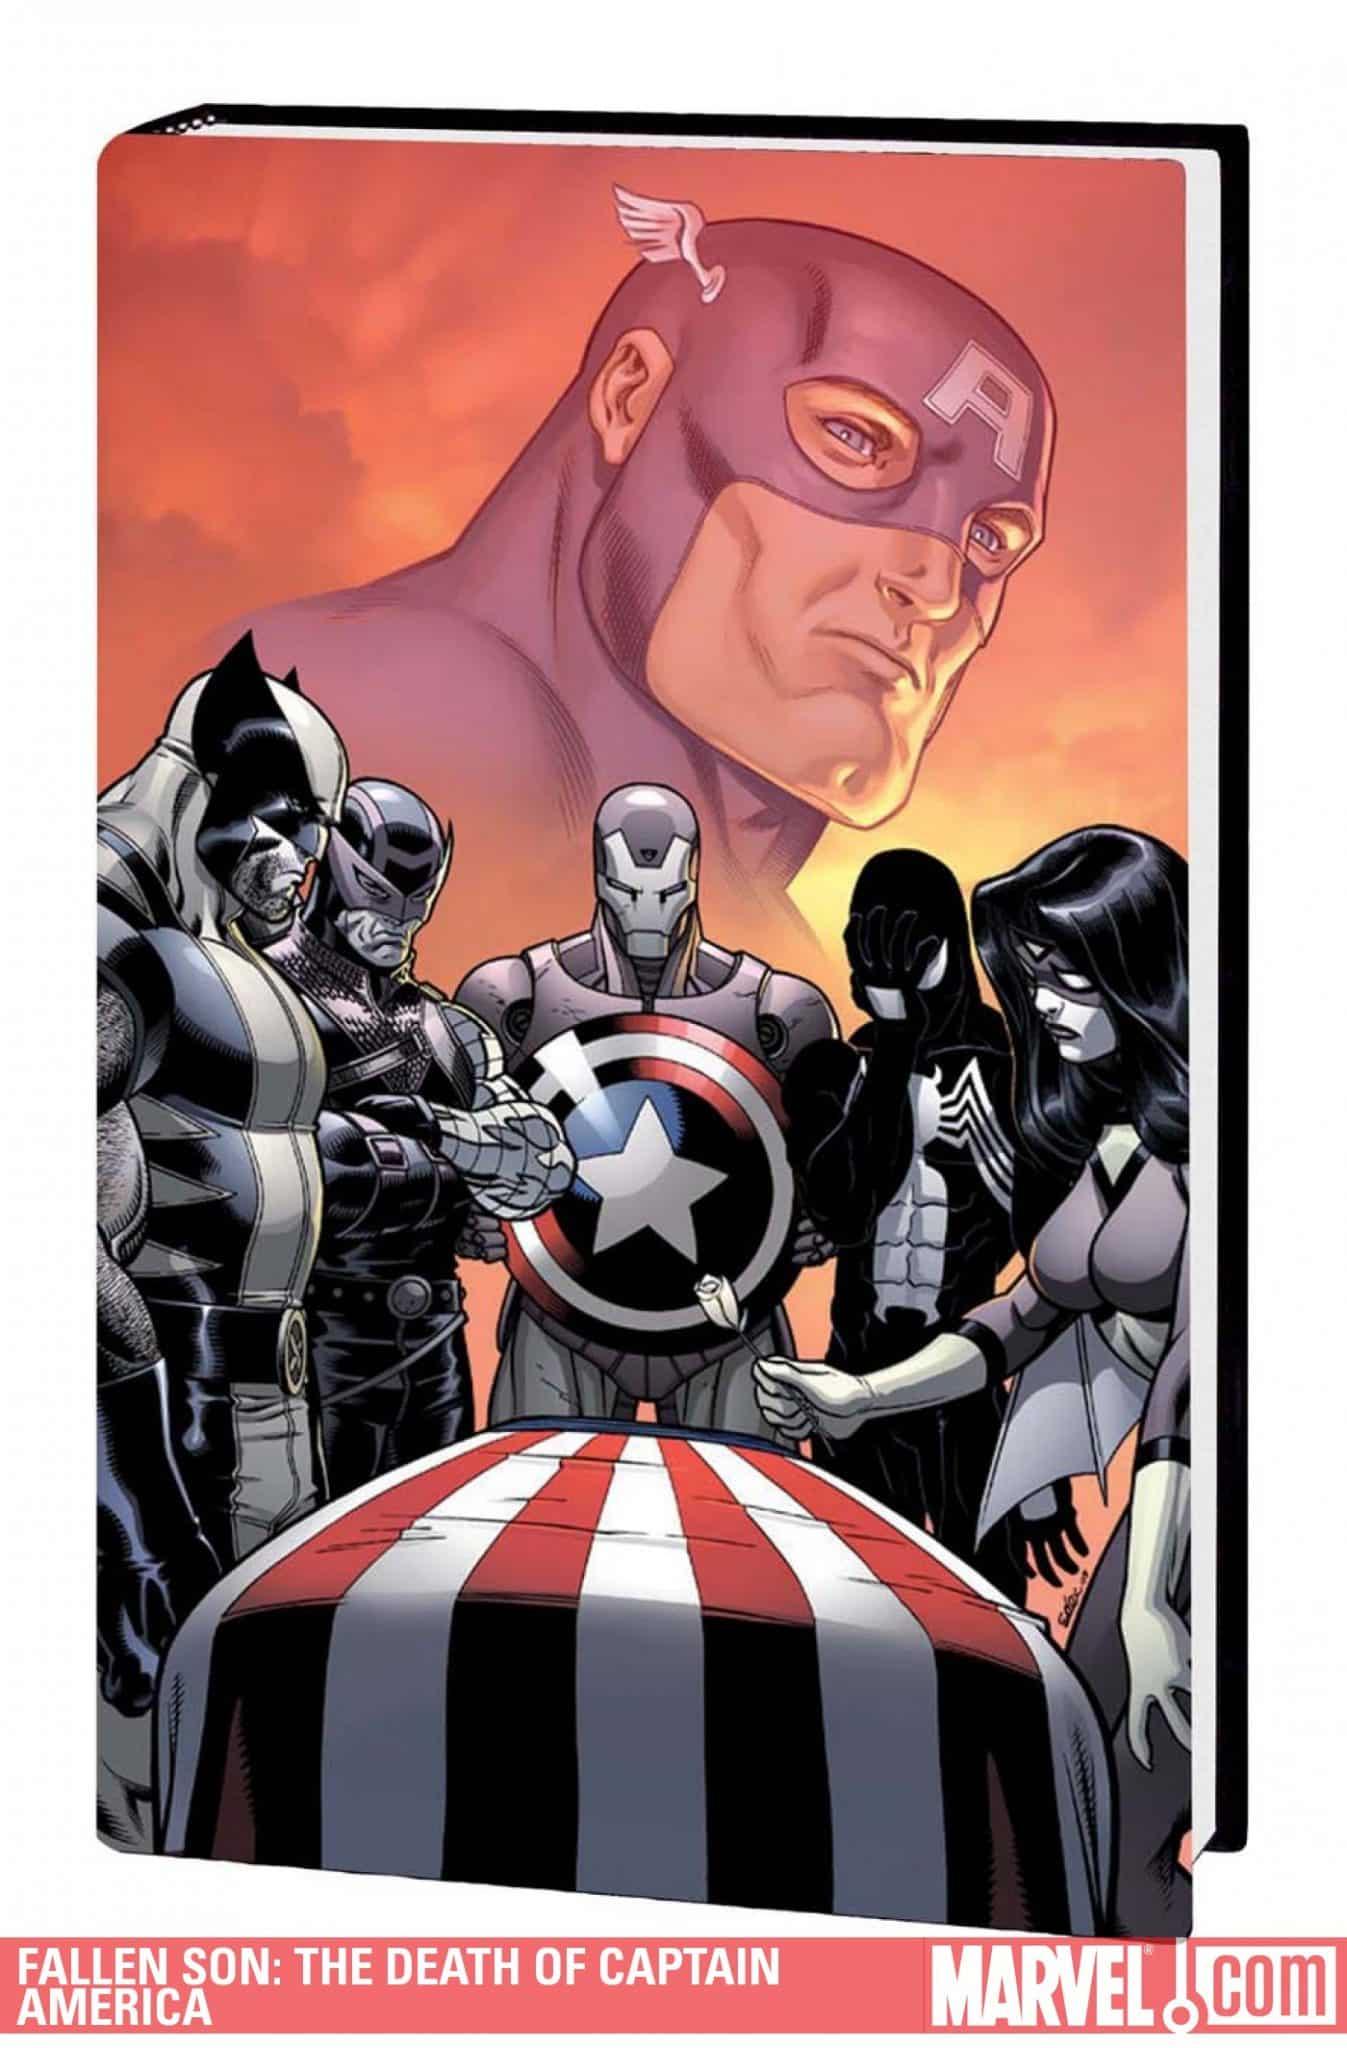 46_fallen_son__the_death_of_captain_america